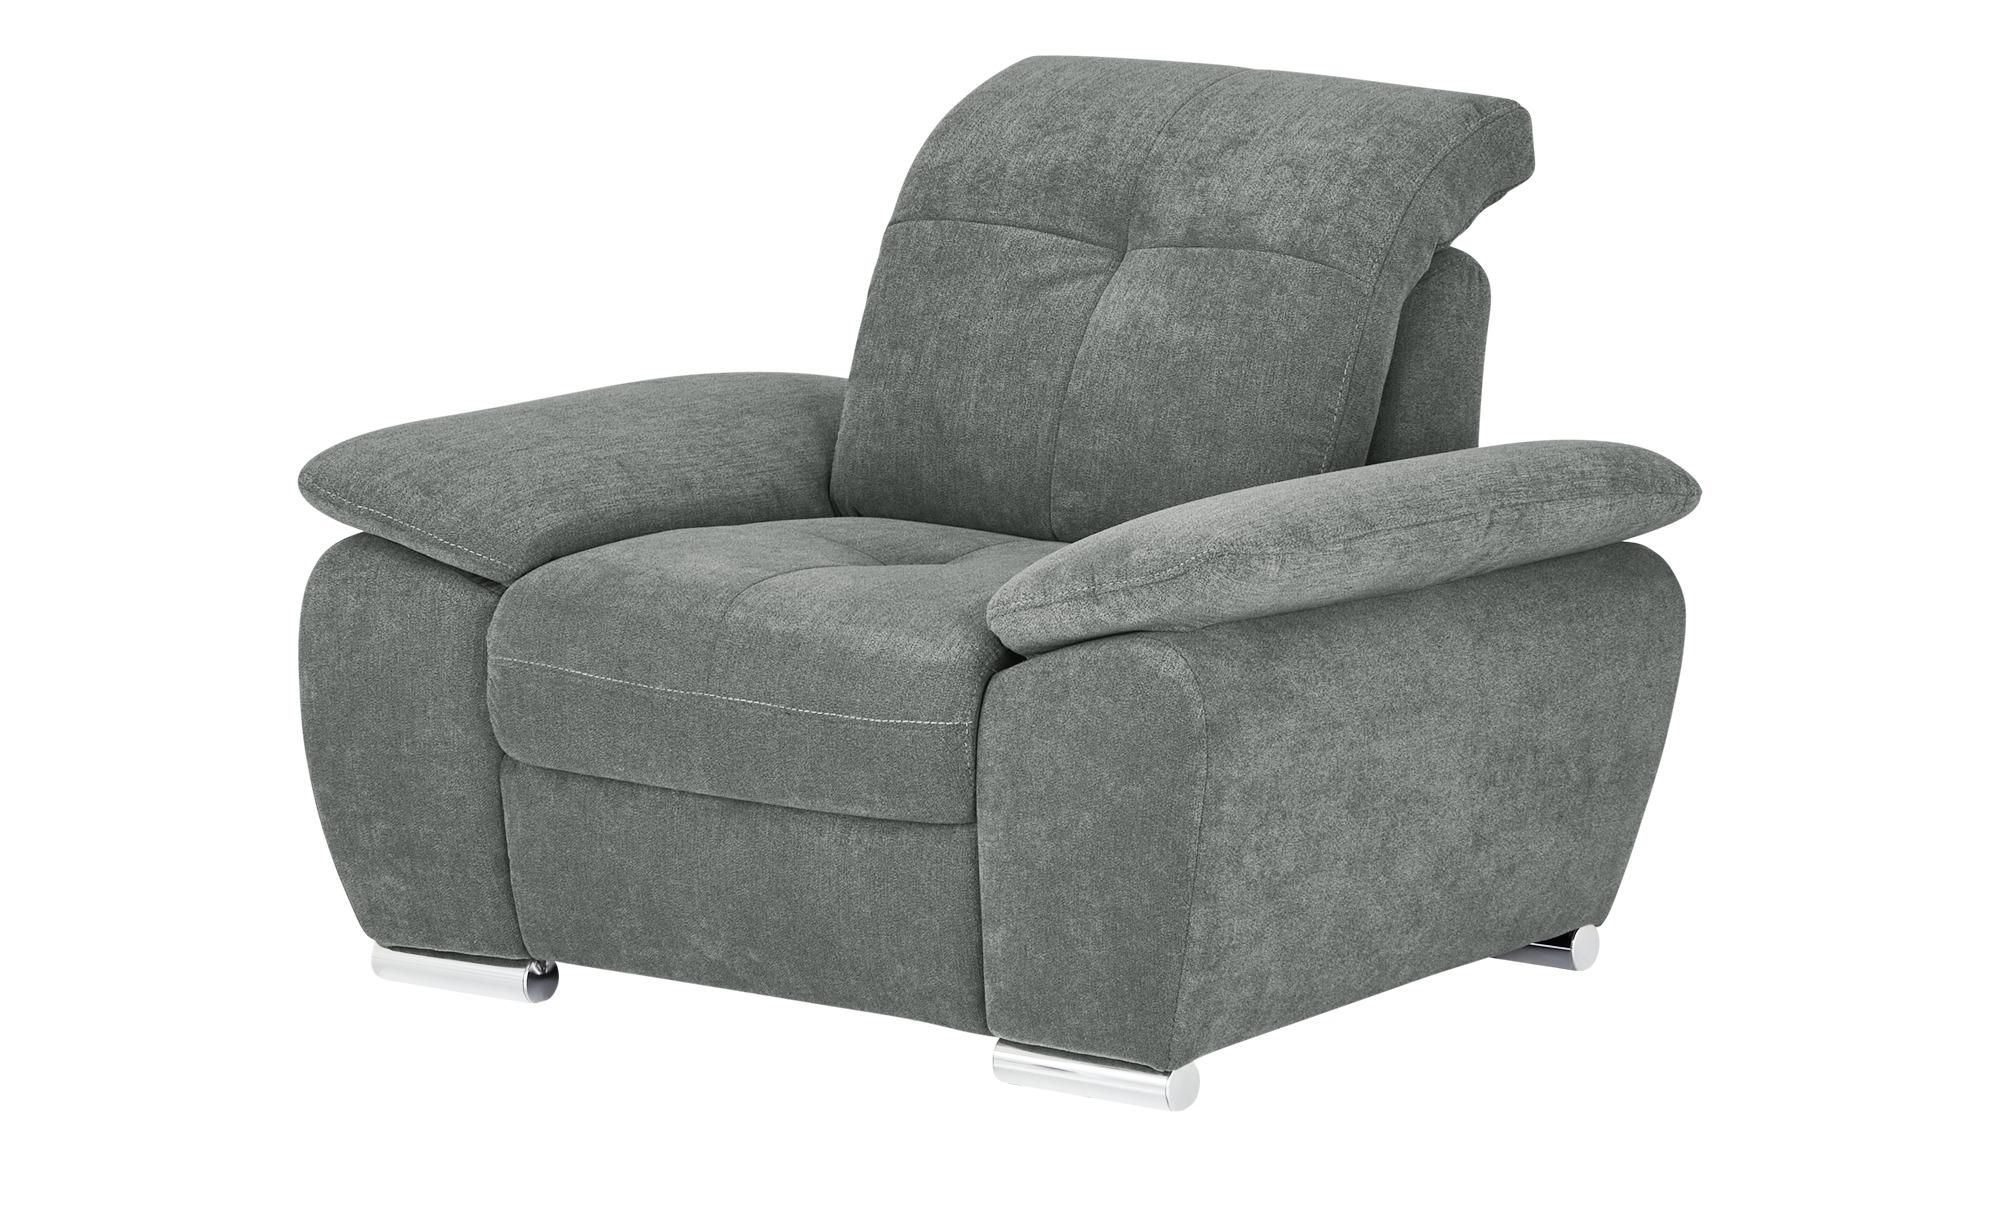 Sessel  Gladays ¦ grau ¦ Maße (cm): B: 108 H: 89 T: 104 Polstermöbel > Sessel > Polstersessel - Höffner